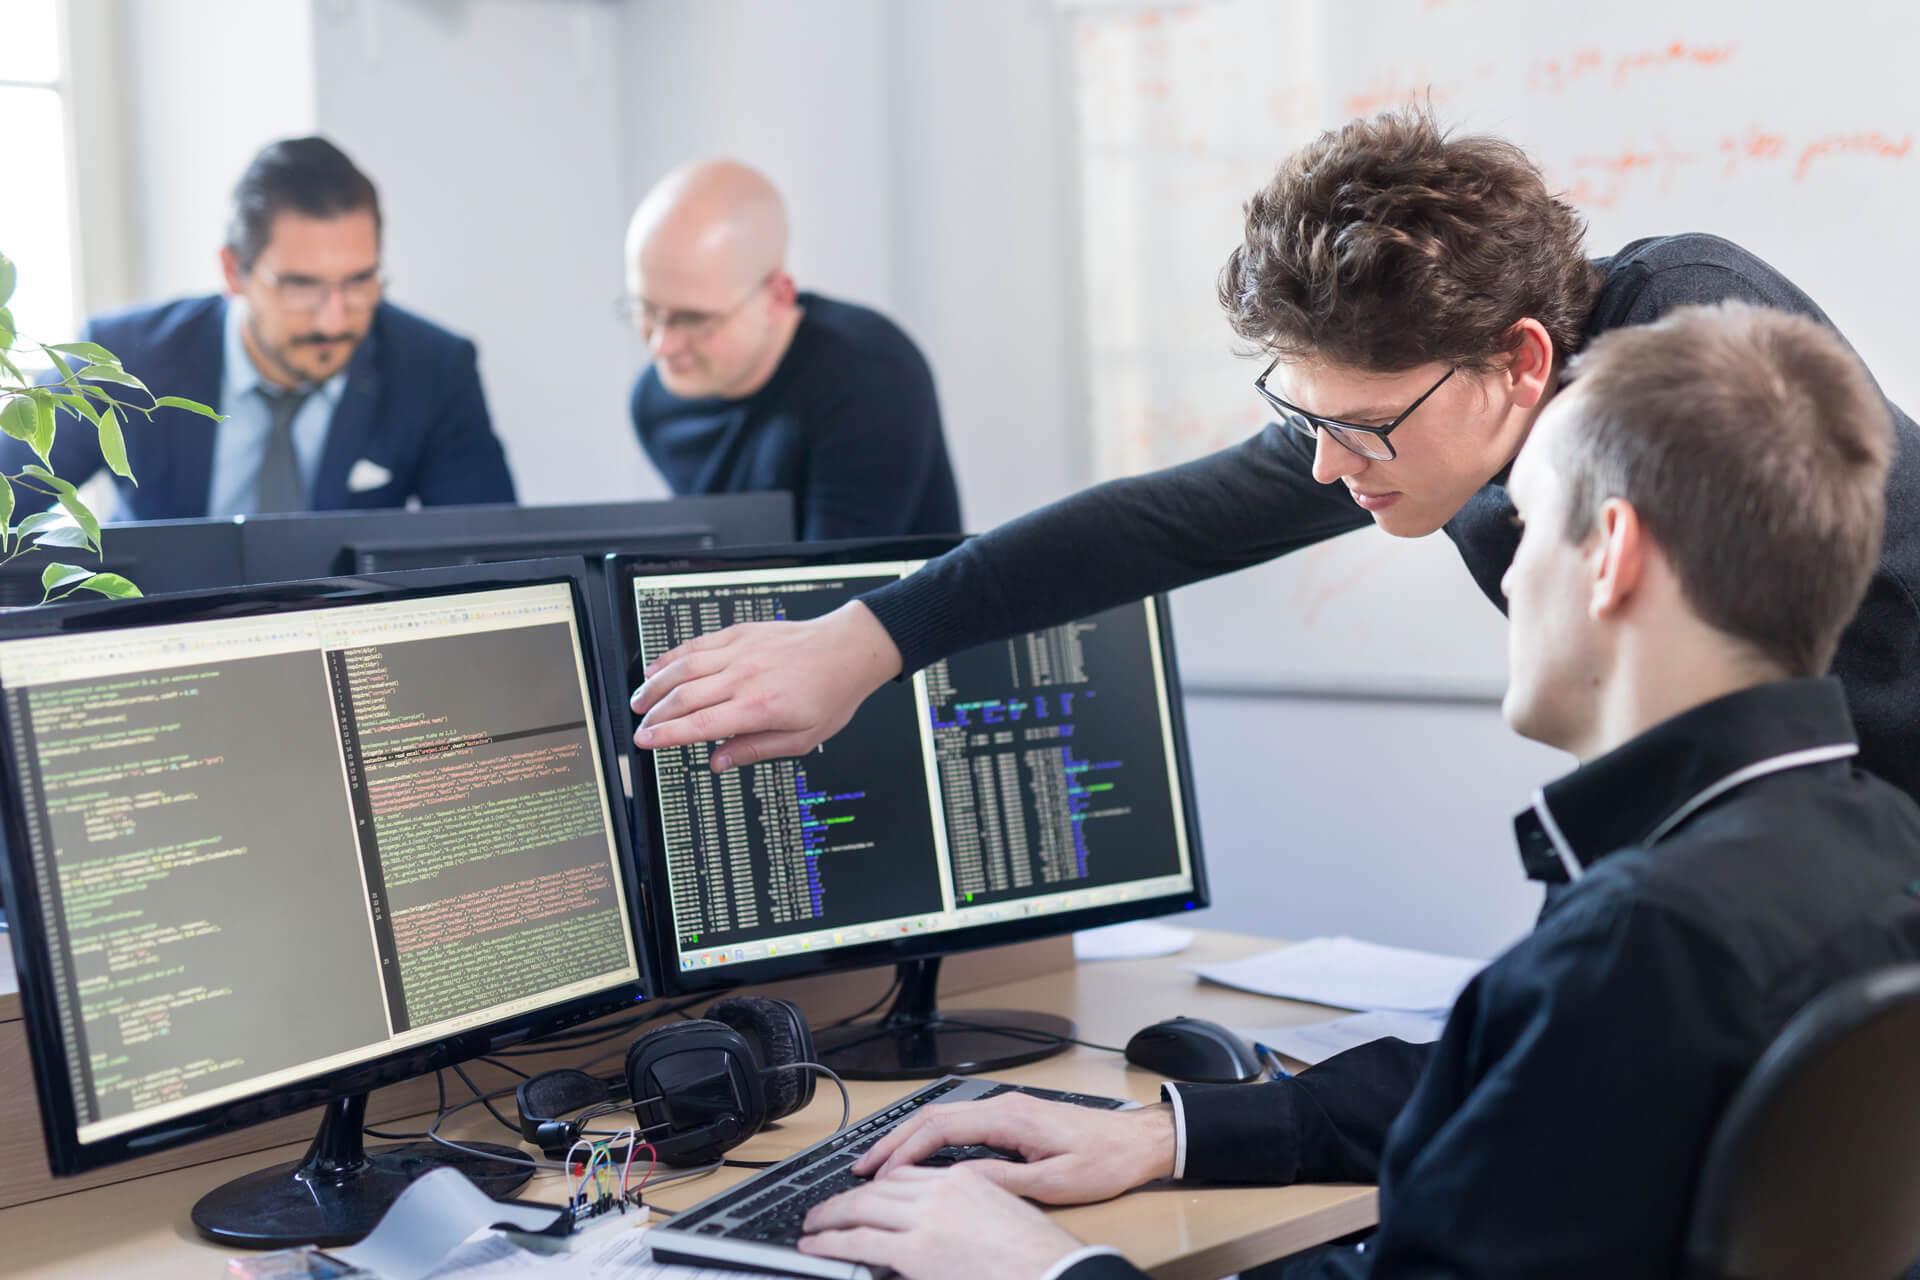 Рейтинг ТОП-10 IT компаний России